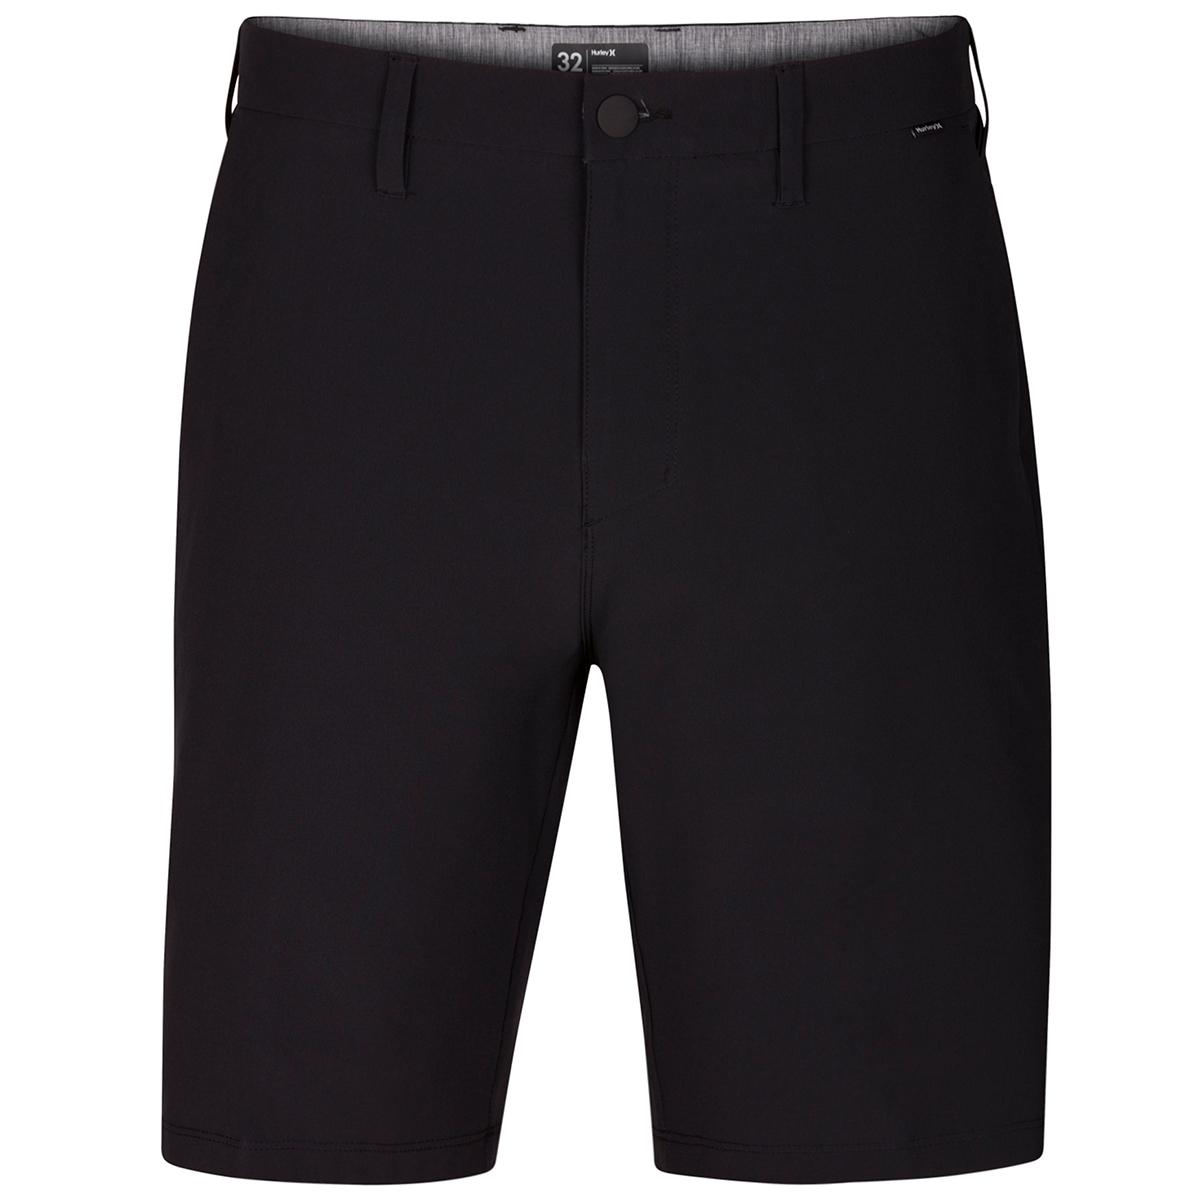 Hurley Men's Phantom Flex Hybrid Walking Shorts - Black, 34